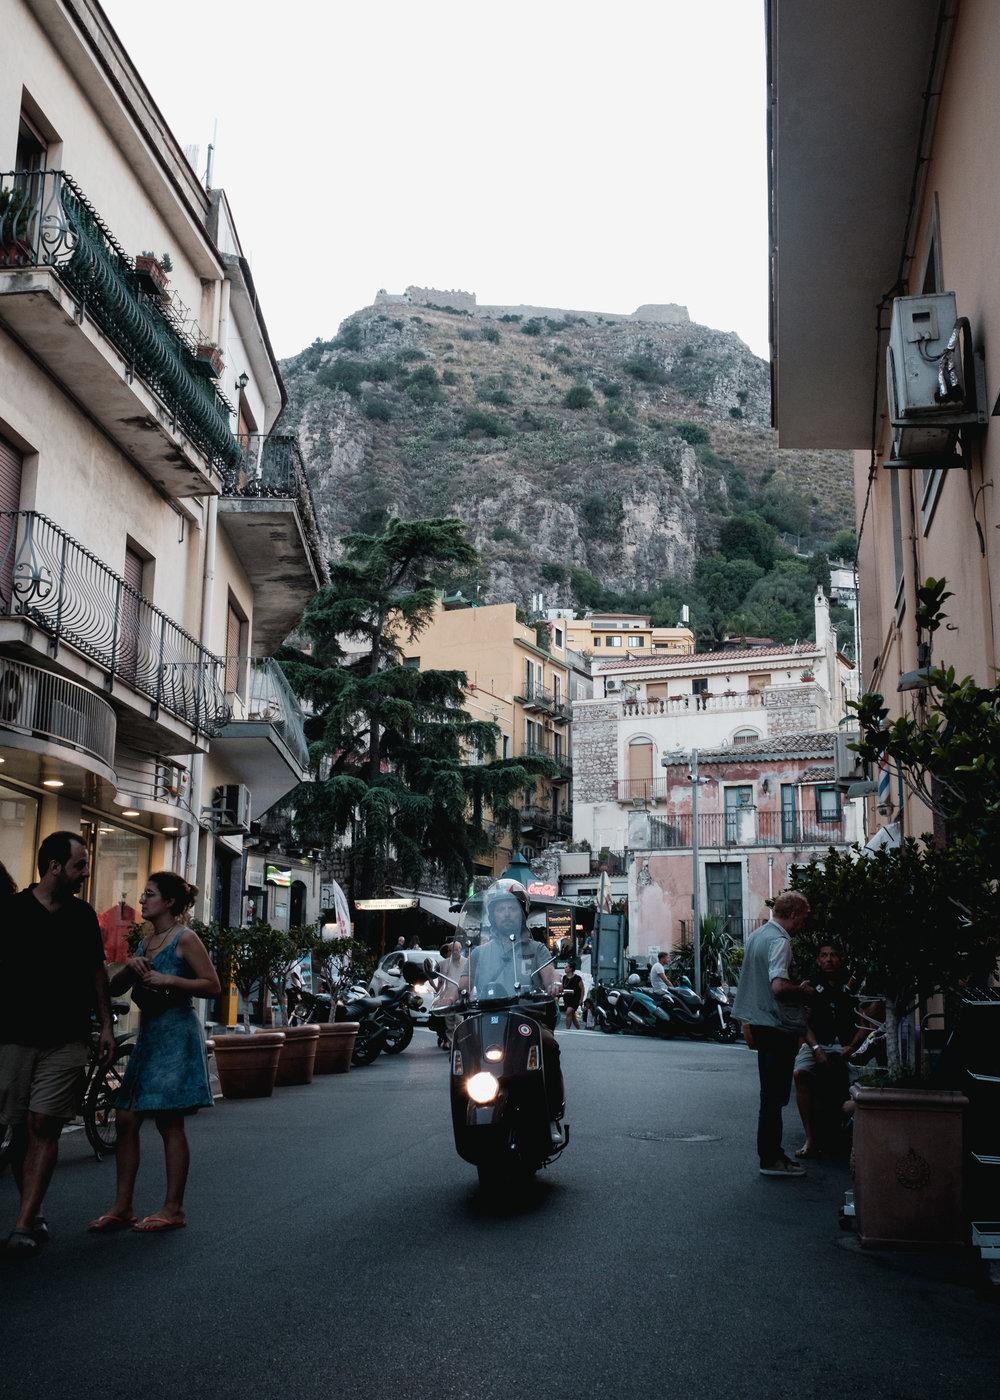 Sicily - 00453 - Chris Goetchius 2017.jpg